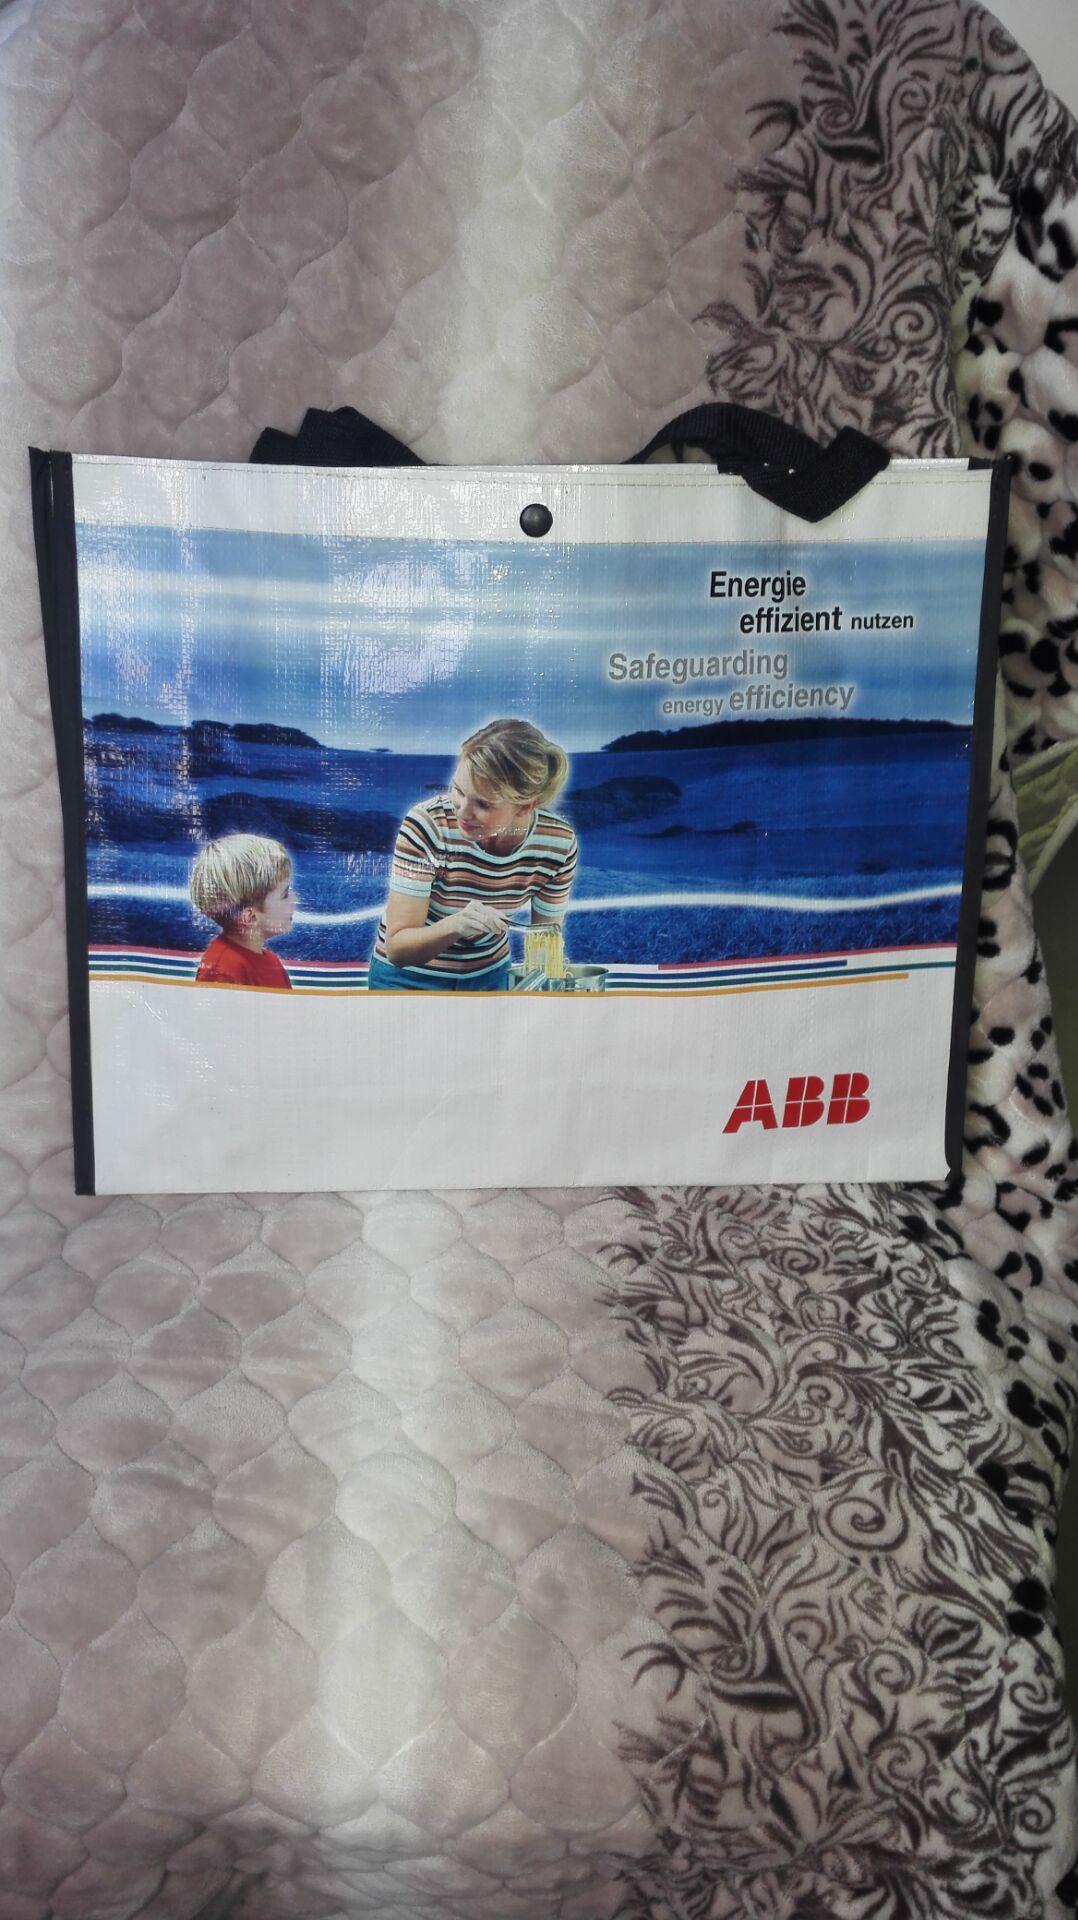 PP Woven Travel Promotional Shopping Hand Bag (HR-PB016)